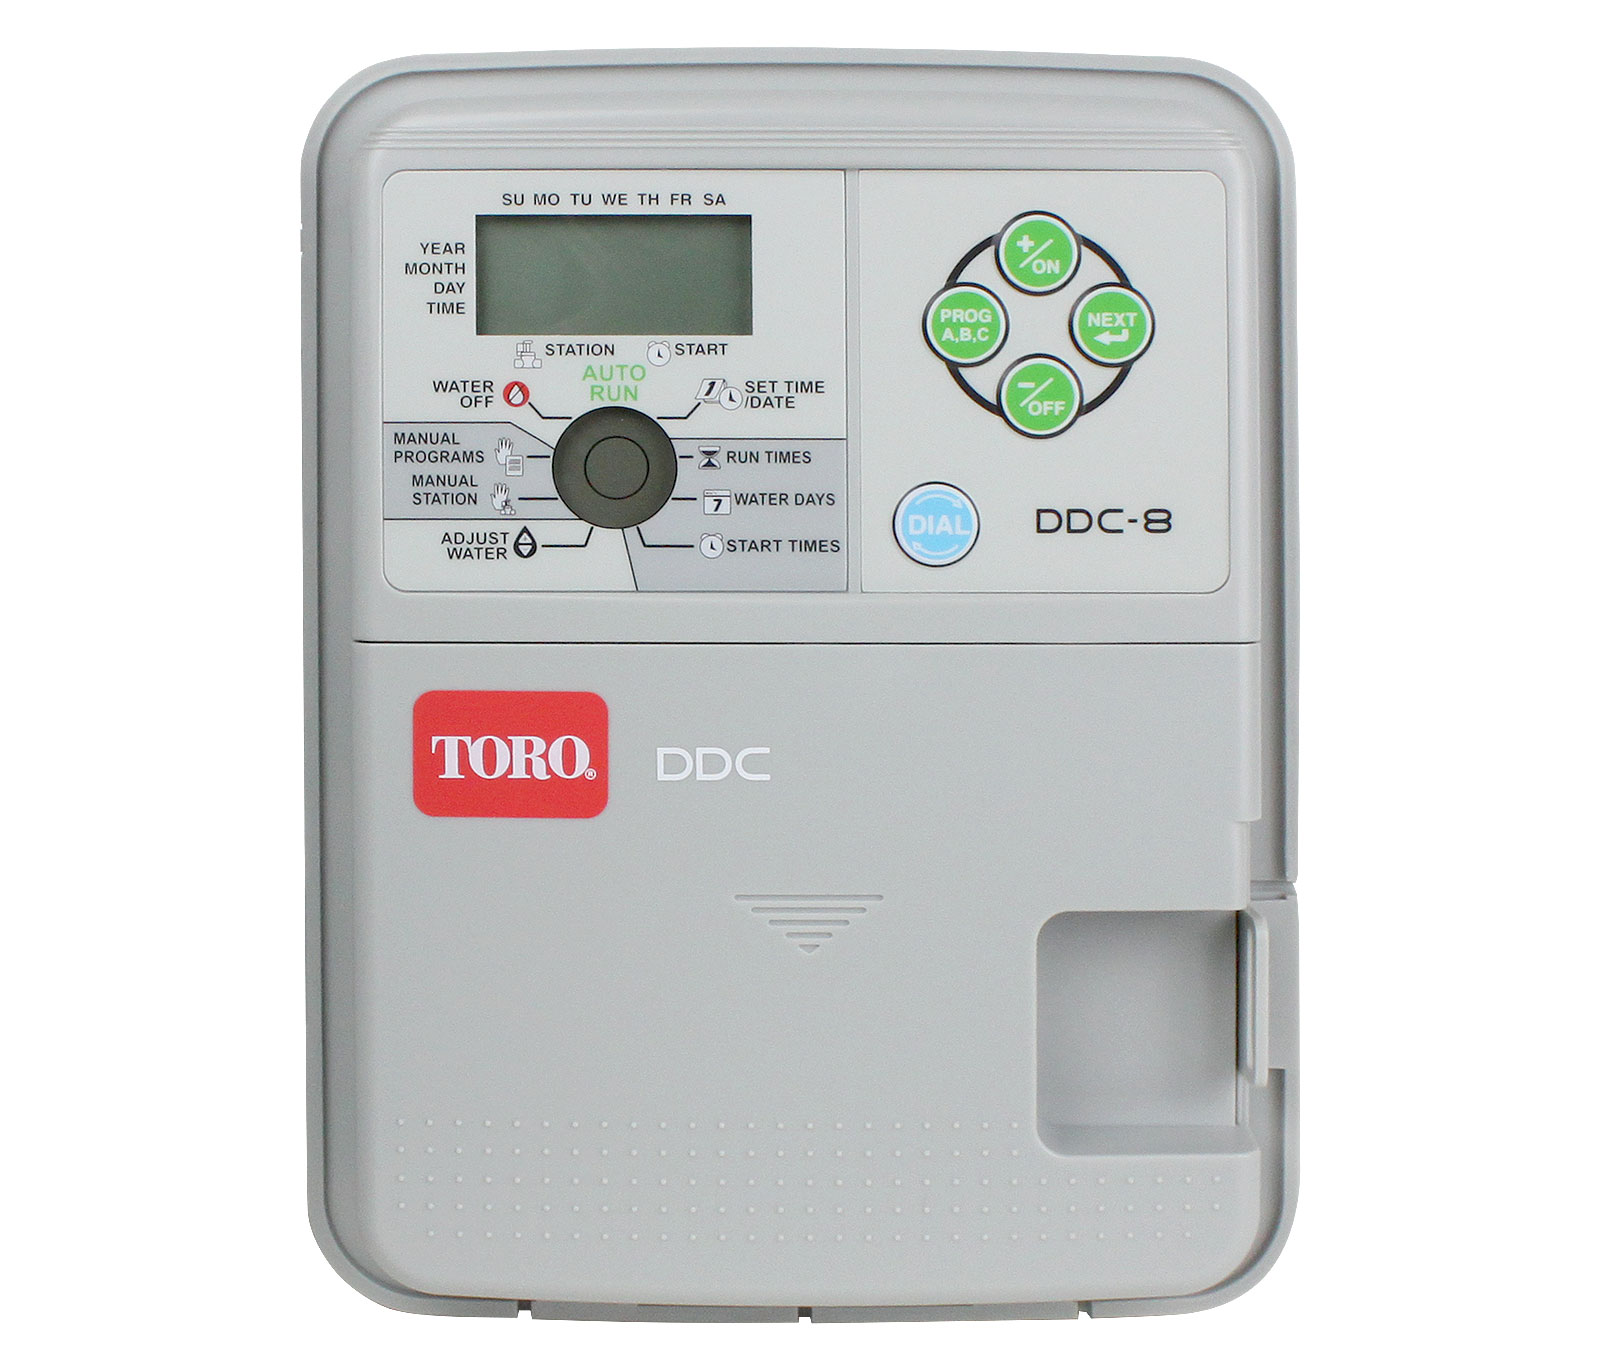 DDC 53808 main.ashx?mw=700&mh=599&hash=C73DE7A7934C22454F374E5AE0660574EE64DF24 toro sprinkler wiring diagram wiring diagram and schematic design wiring diagram toro sprinkler control at gsmx.co